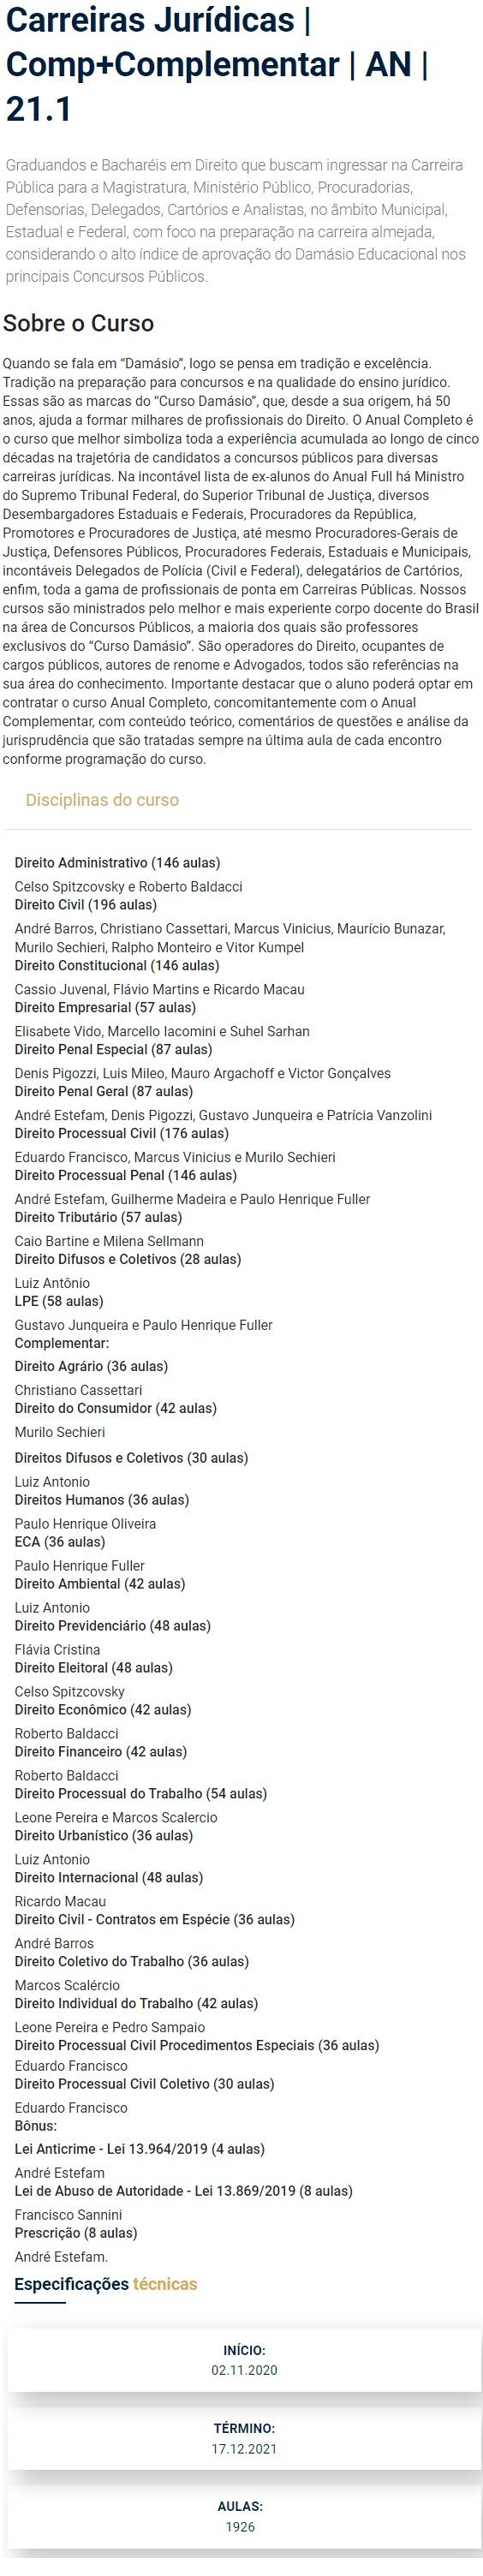 https://www.rateioconcurso.com/wp-content/uploads/2021/01/04-Carreiras-Jurídicas-Completo-Anual-Complementares-DAMÁSIO-2021.jpg